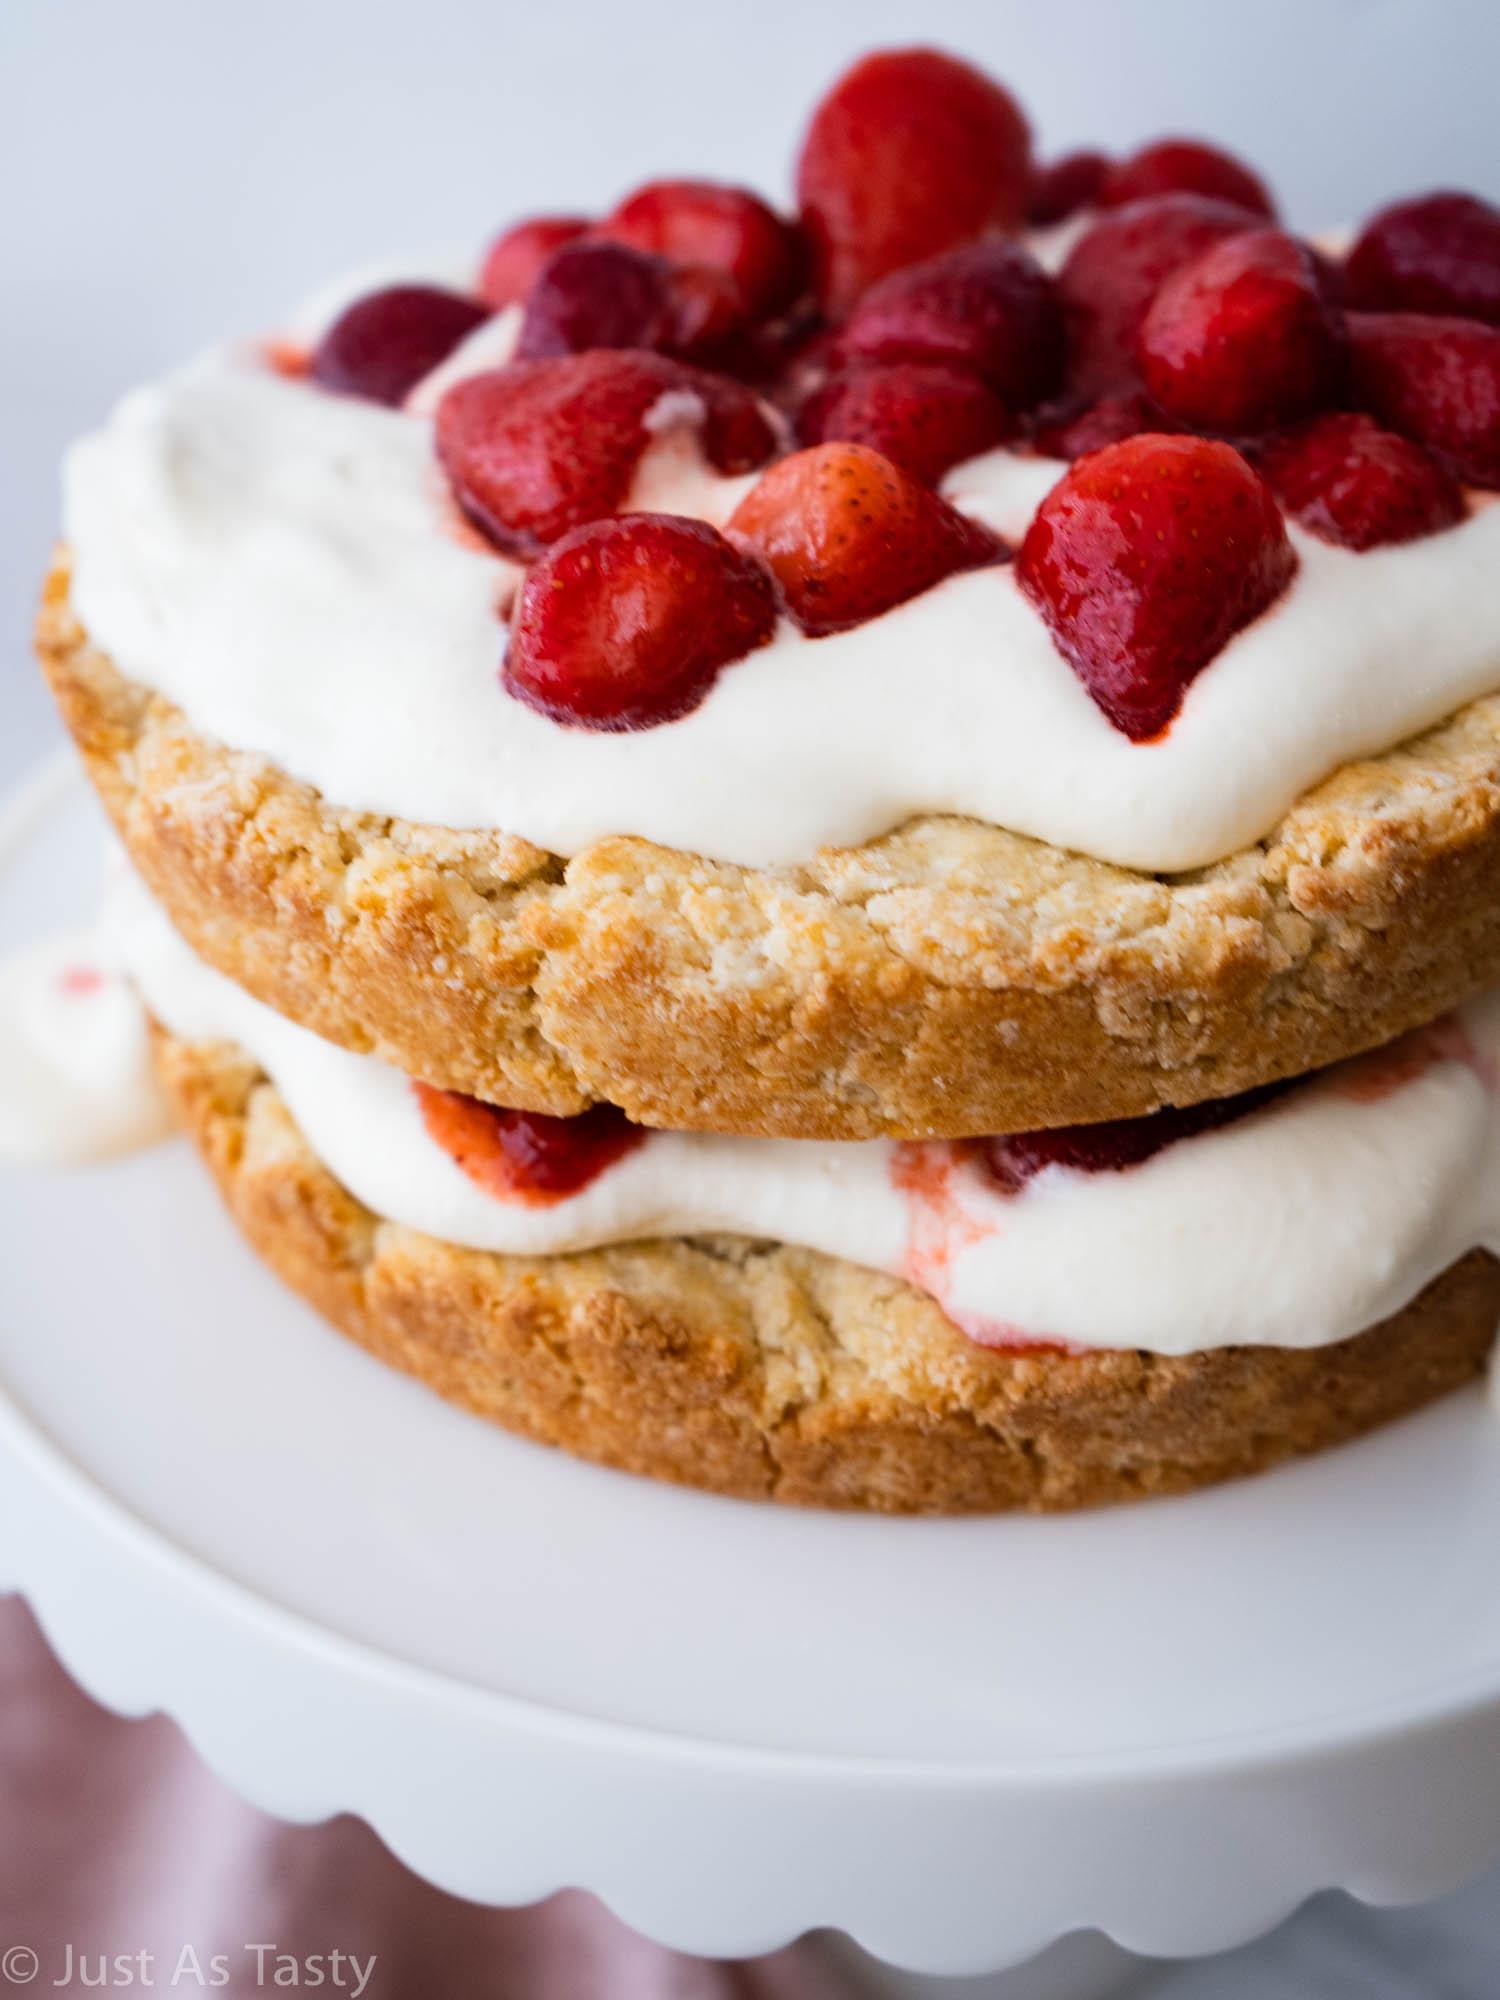 Gluten free strawberry shortcake on a white cake stand.